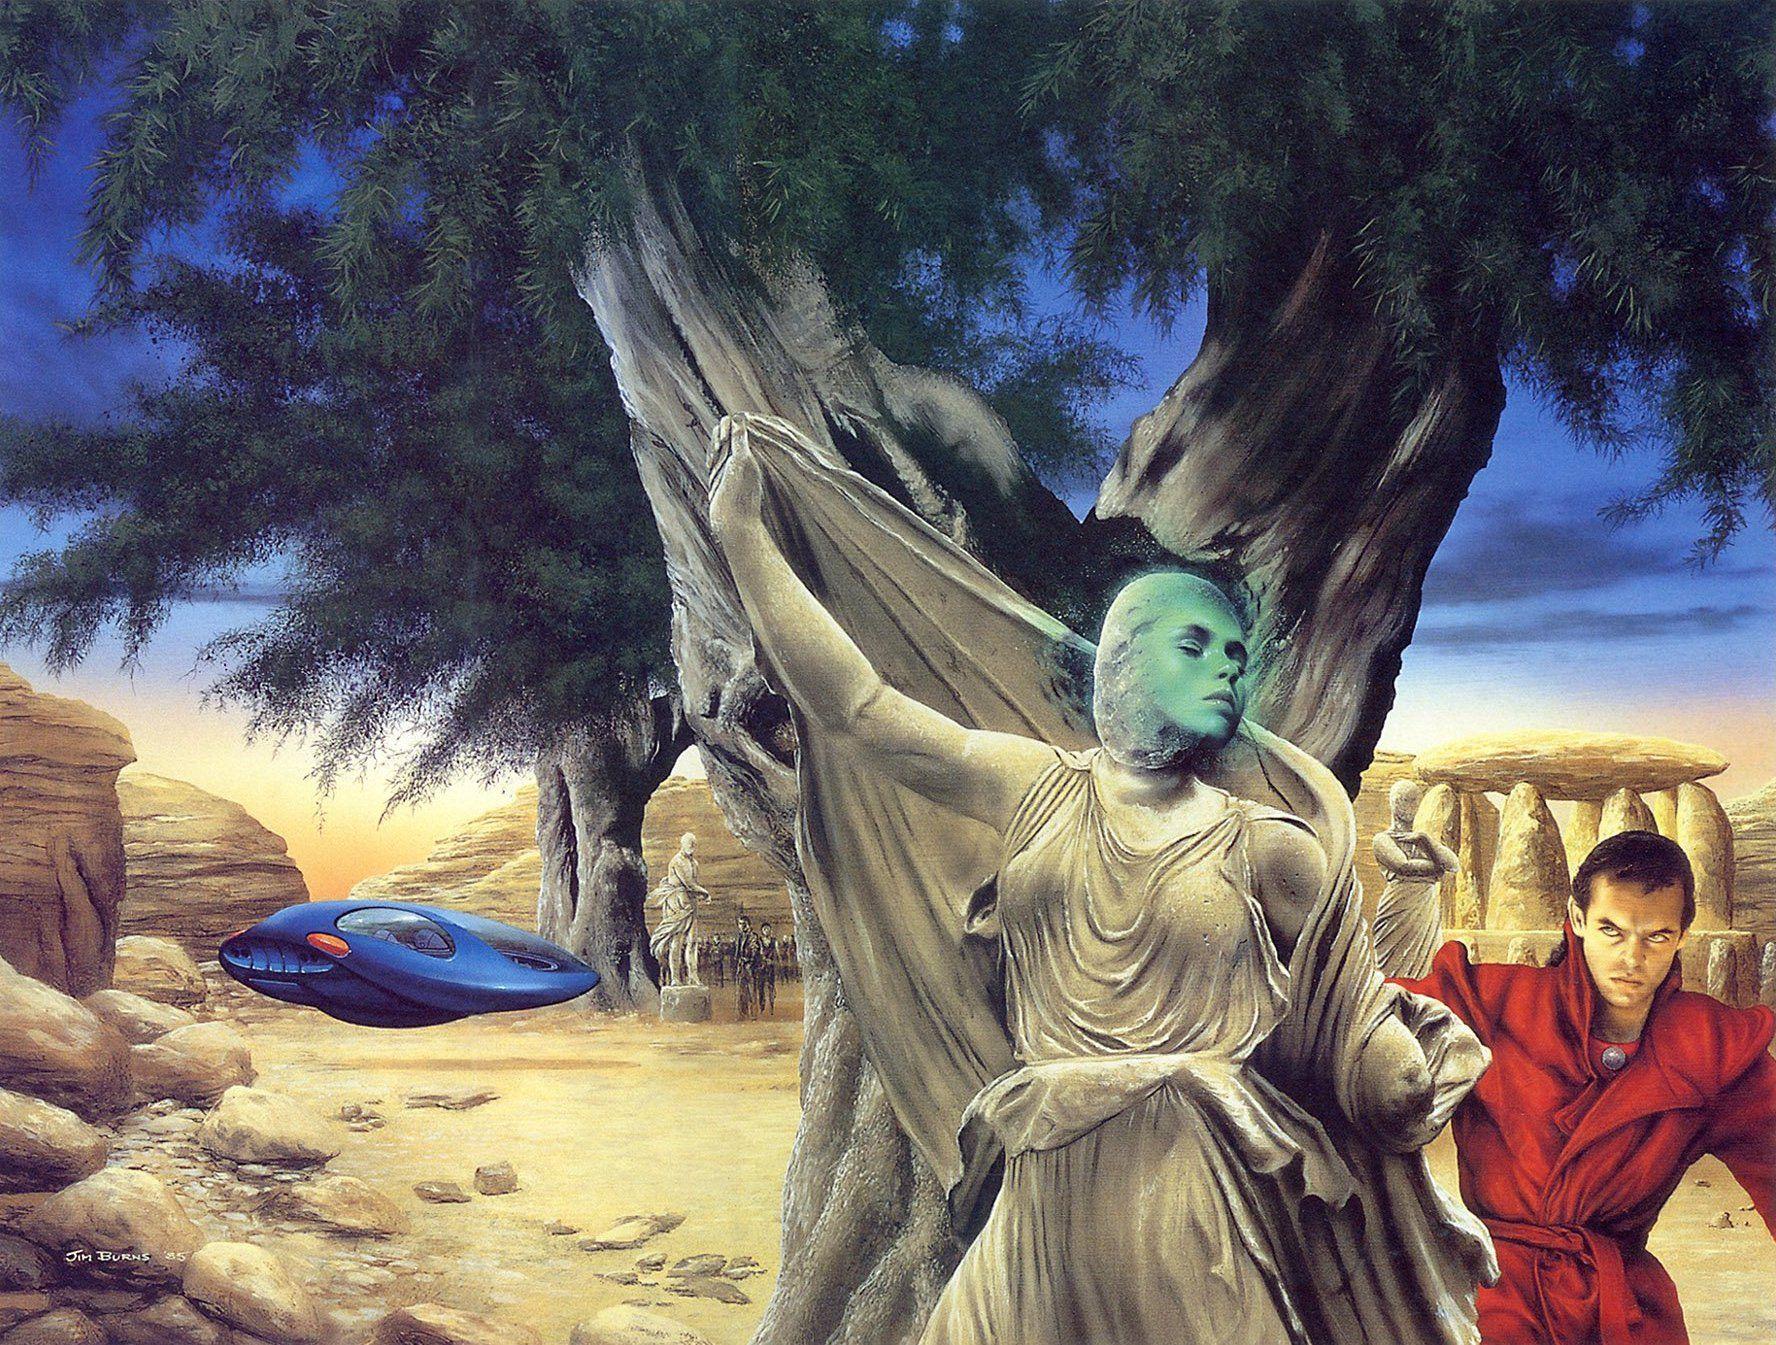 Jim Burns The Man Who Melted Fantasy Sci Fi Art Pinterest Circuit Boardsart Is Interpretation